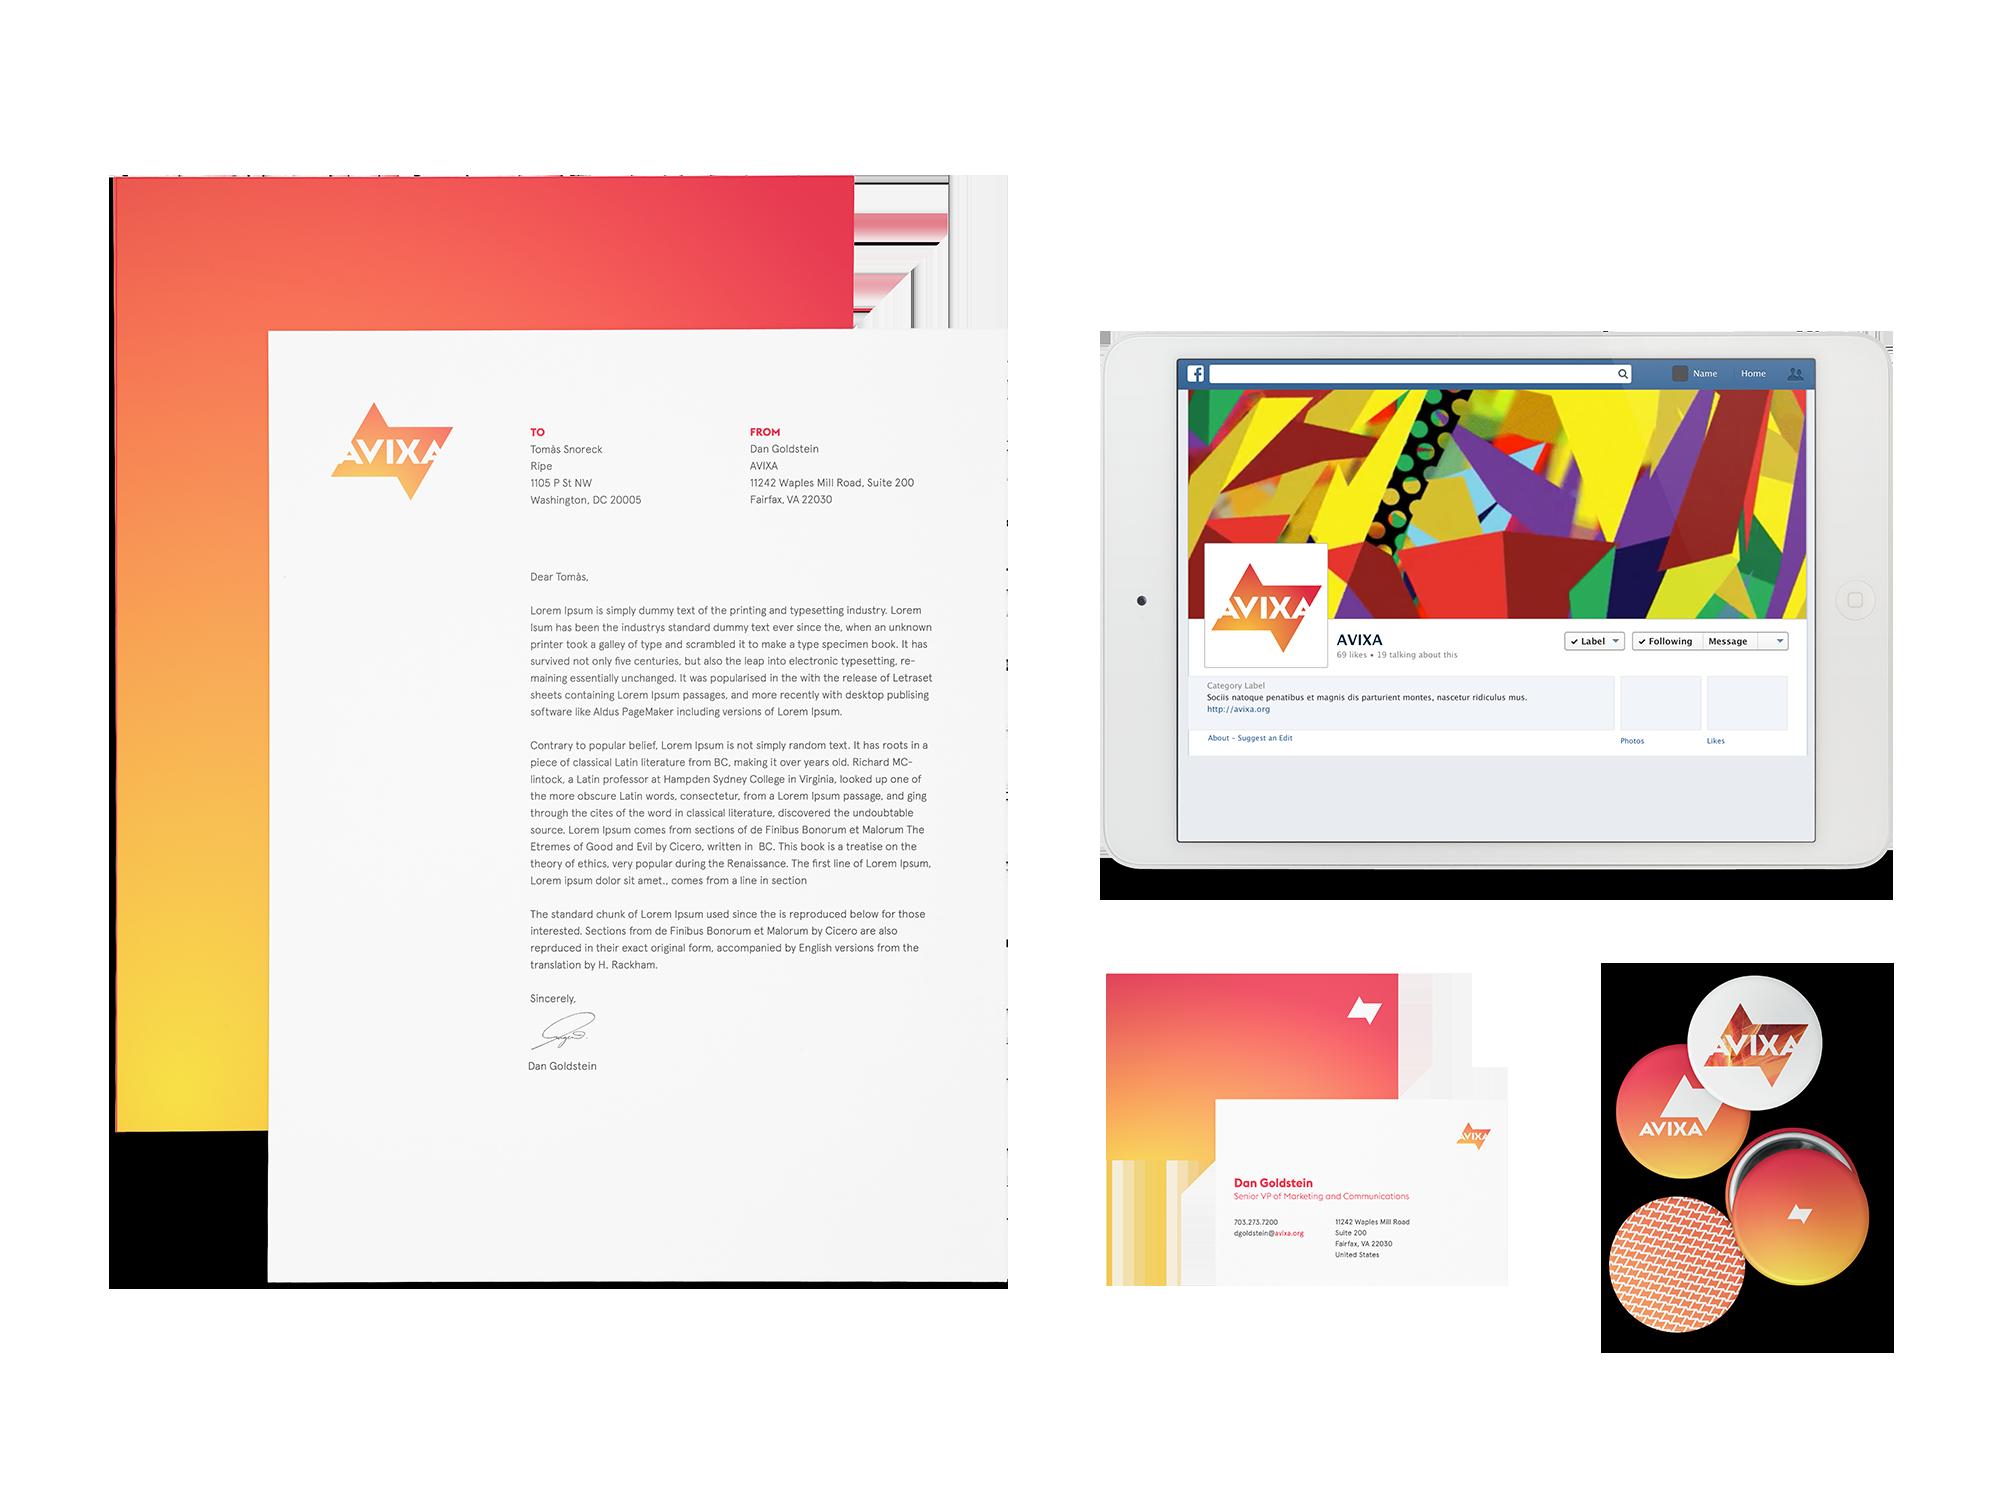 avixa-application-document_system